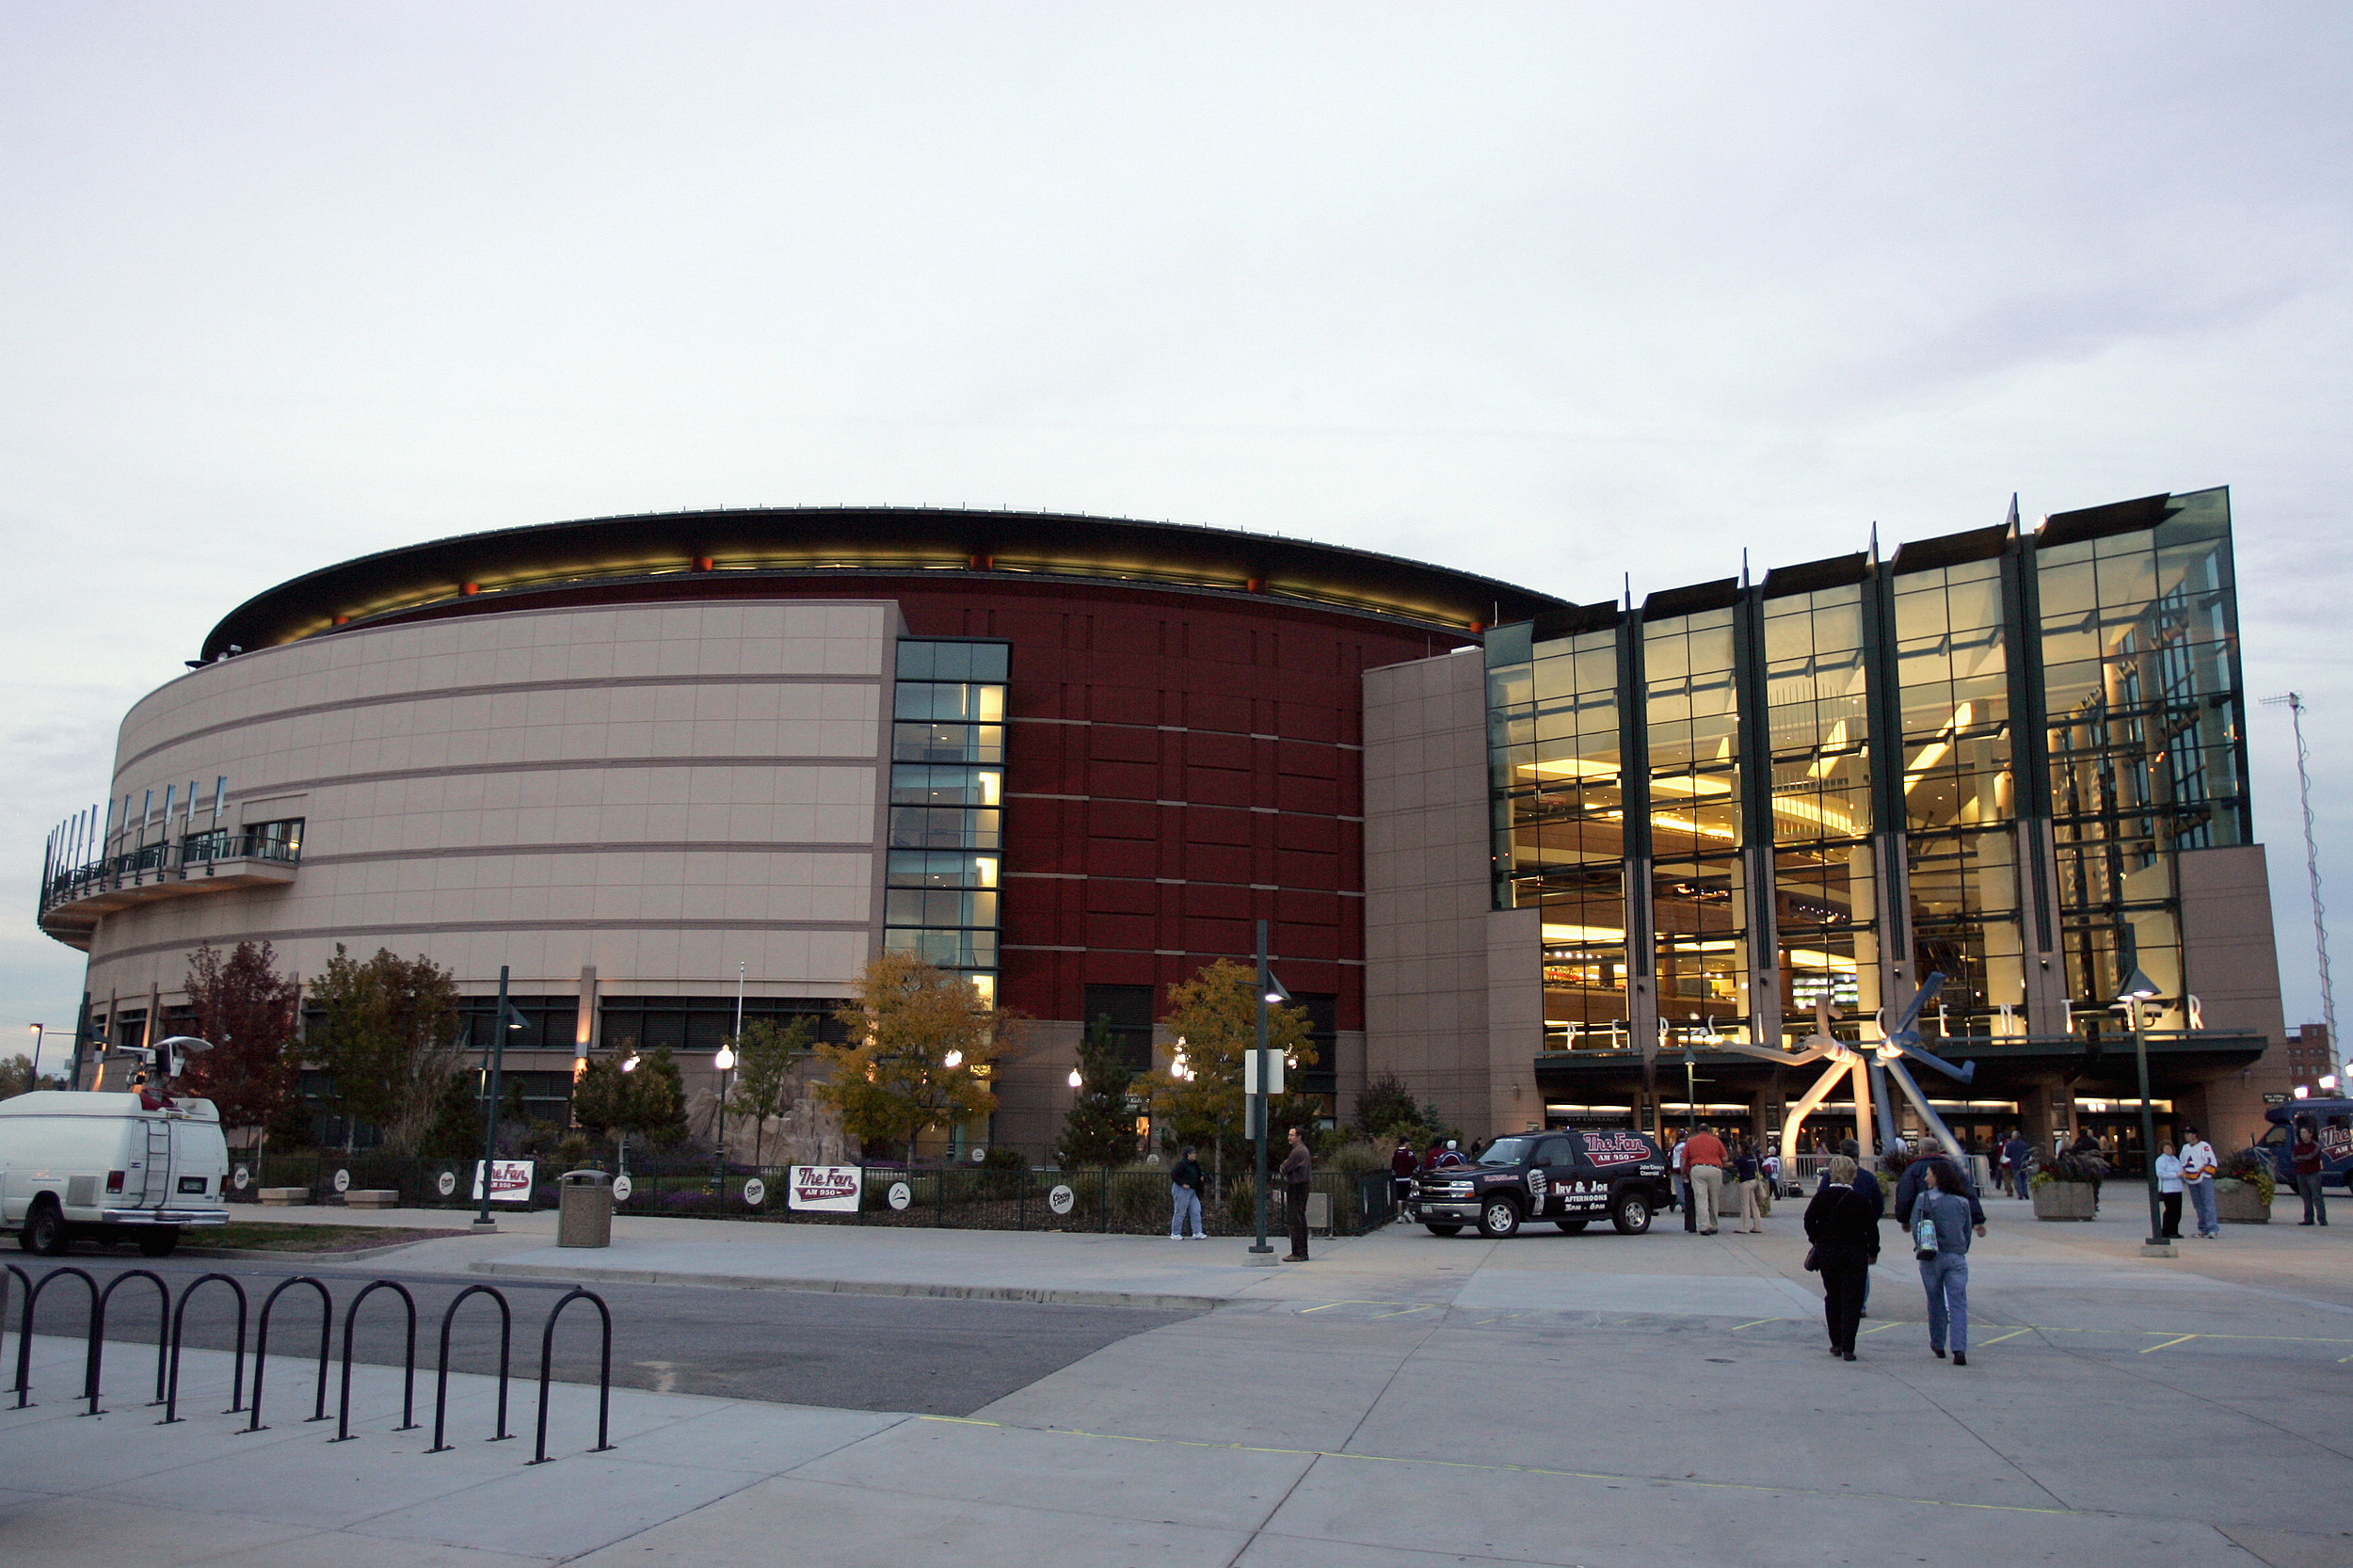 Pepsi Center in Denver